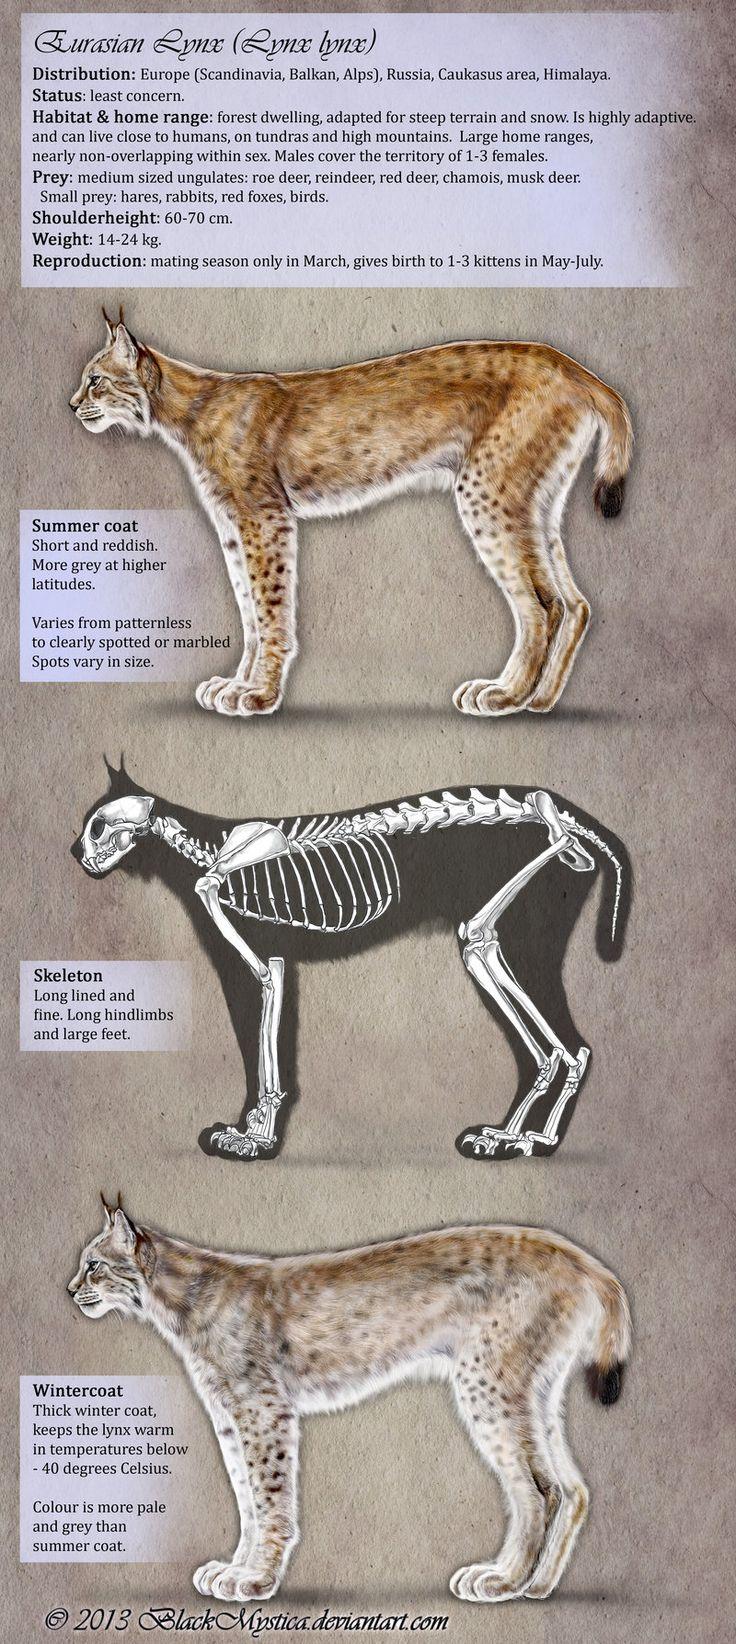 Appearance of the Eurasian Lynx by BlackMysticA.deviantart.com on @DeviantArt